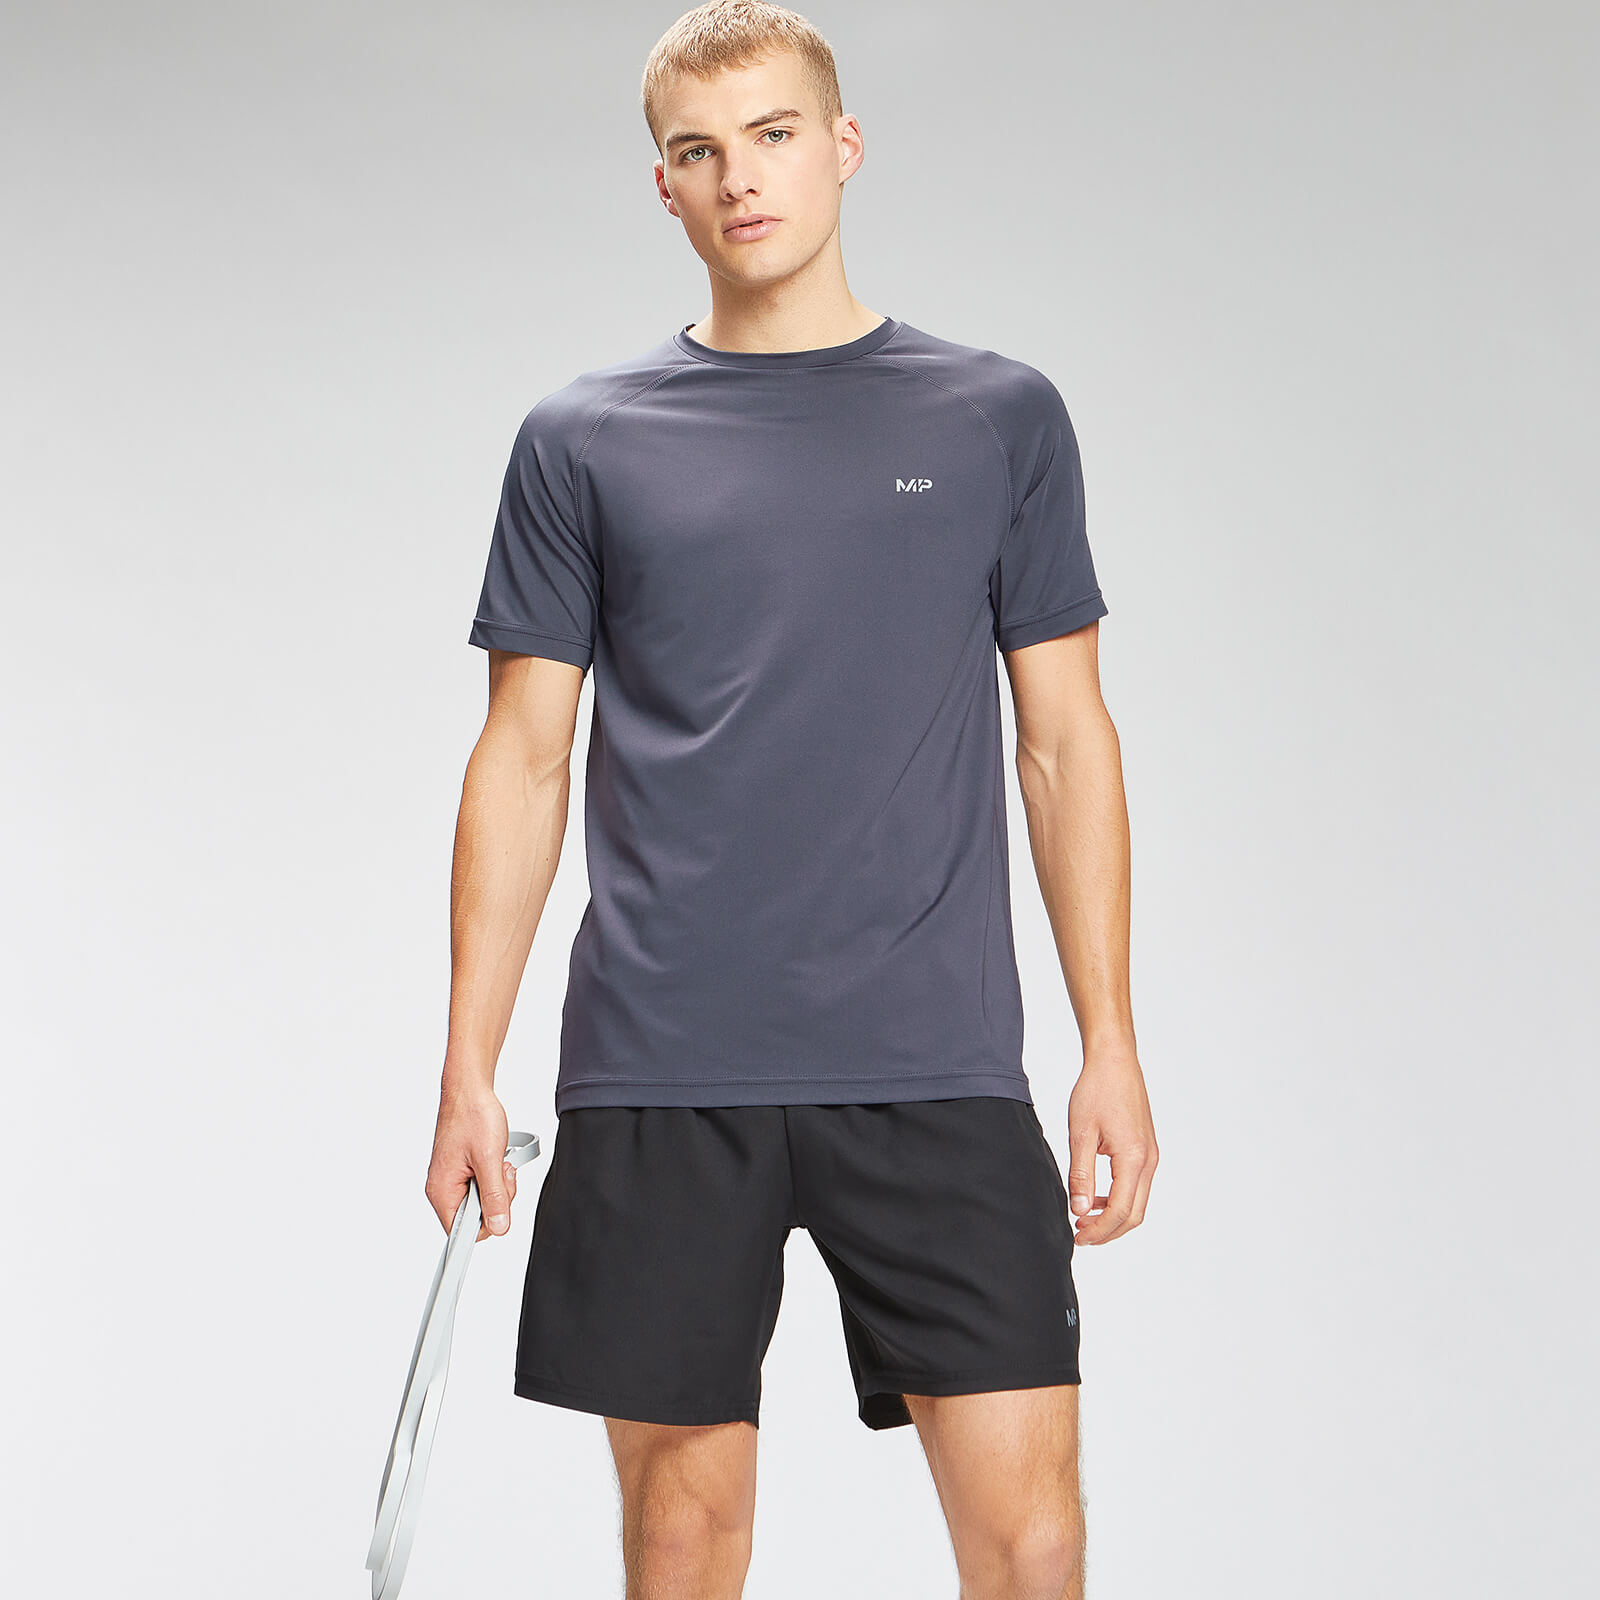 Купить MP Men's Repeat Graphic Training Short Sleeve T-Shirt - Graphite - XXXL, Myprotein International